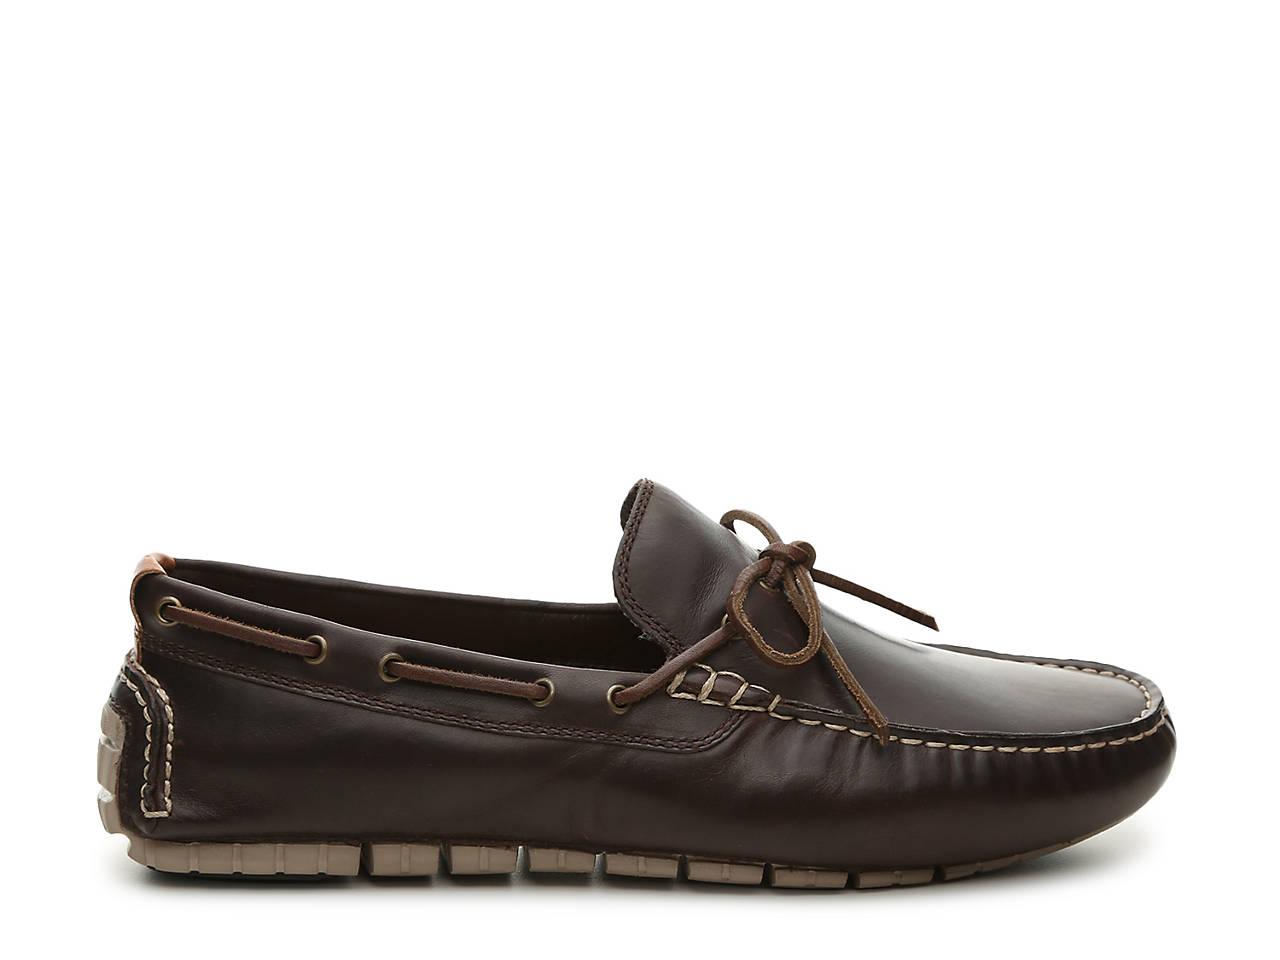 c67e01495e0 Cole Haan Zerogrand Camp Loafer Men s Shoes